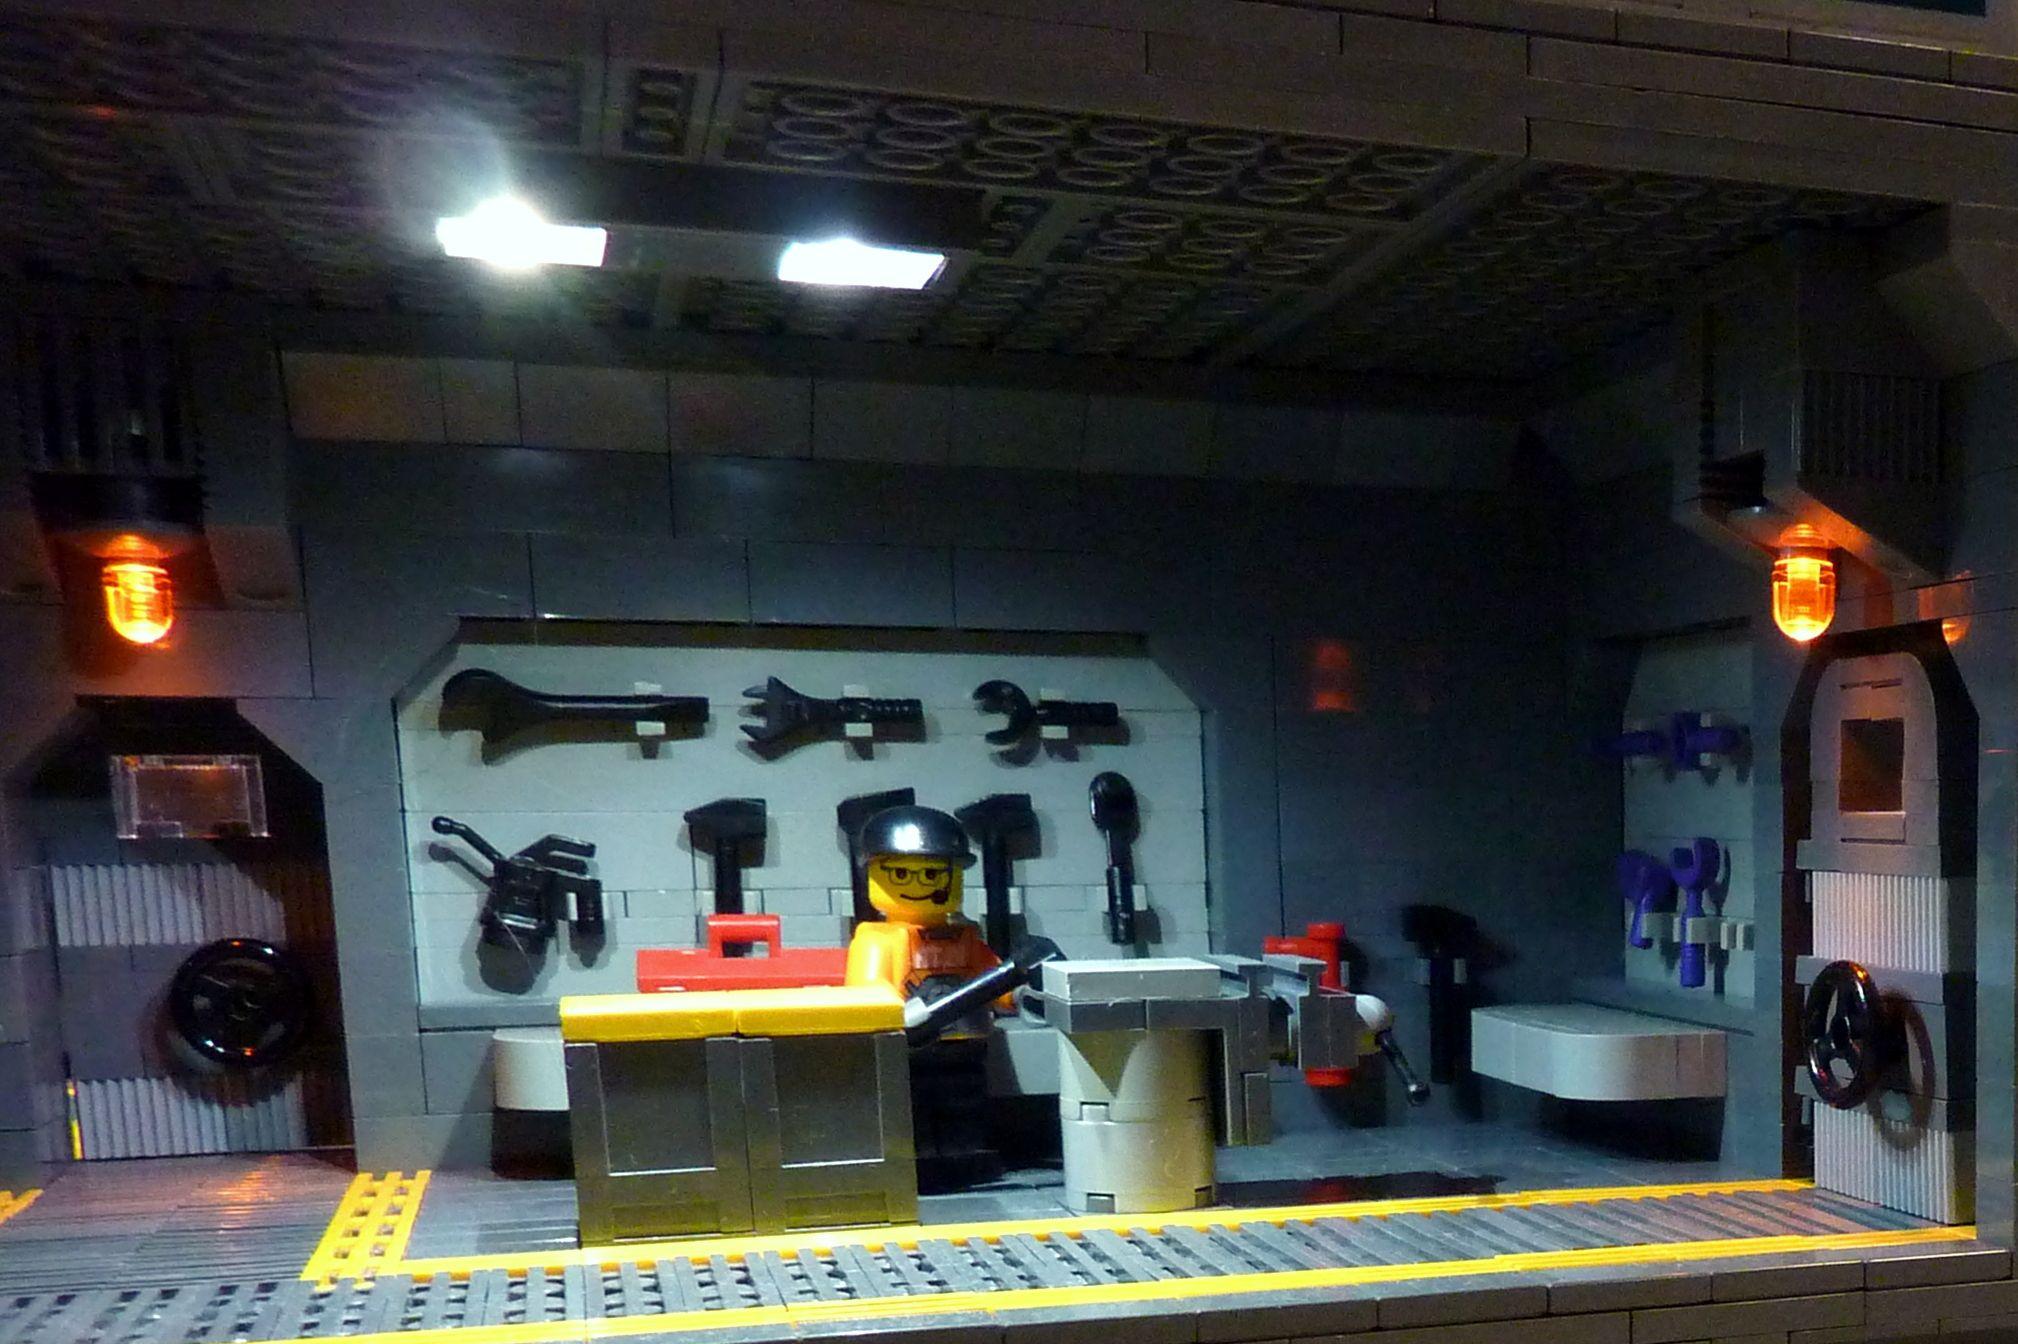 Pin Von Stone Art Jorg Kempe Auf Industrie 4 0 Lego Lego Ideen Lego Militar